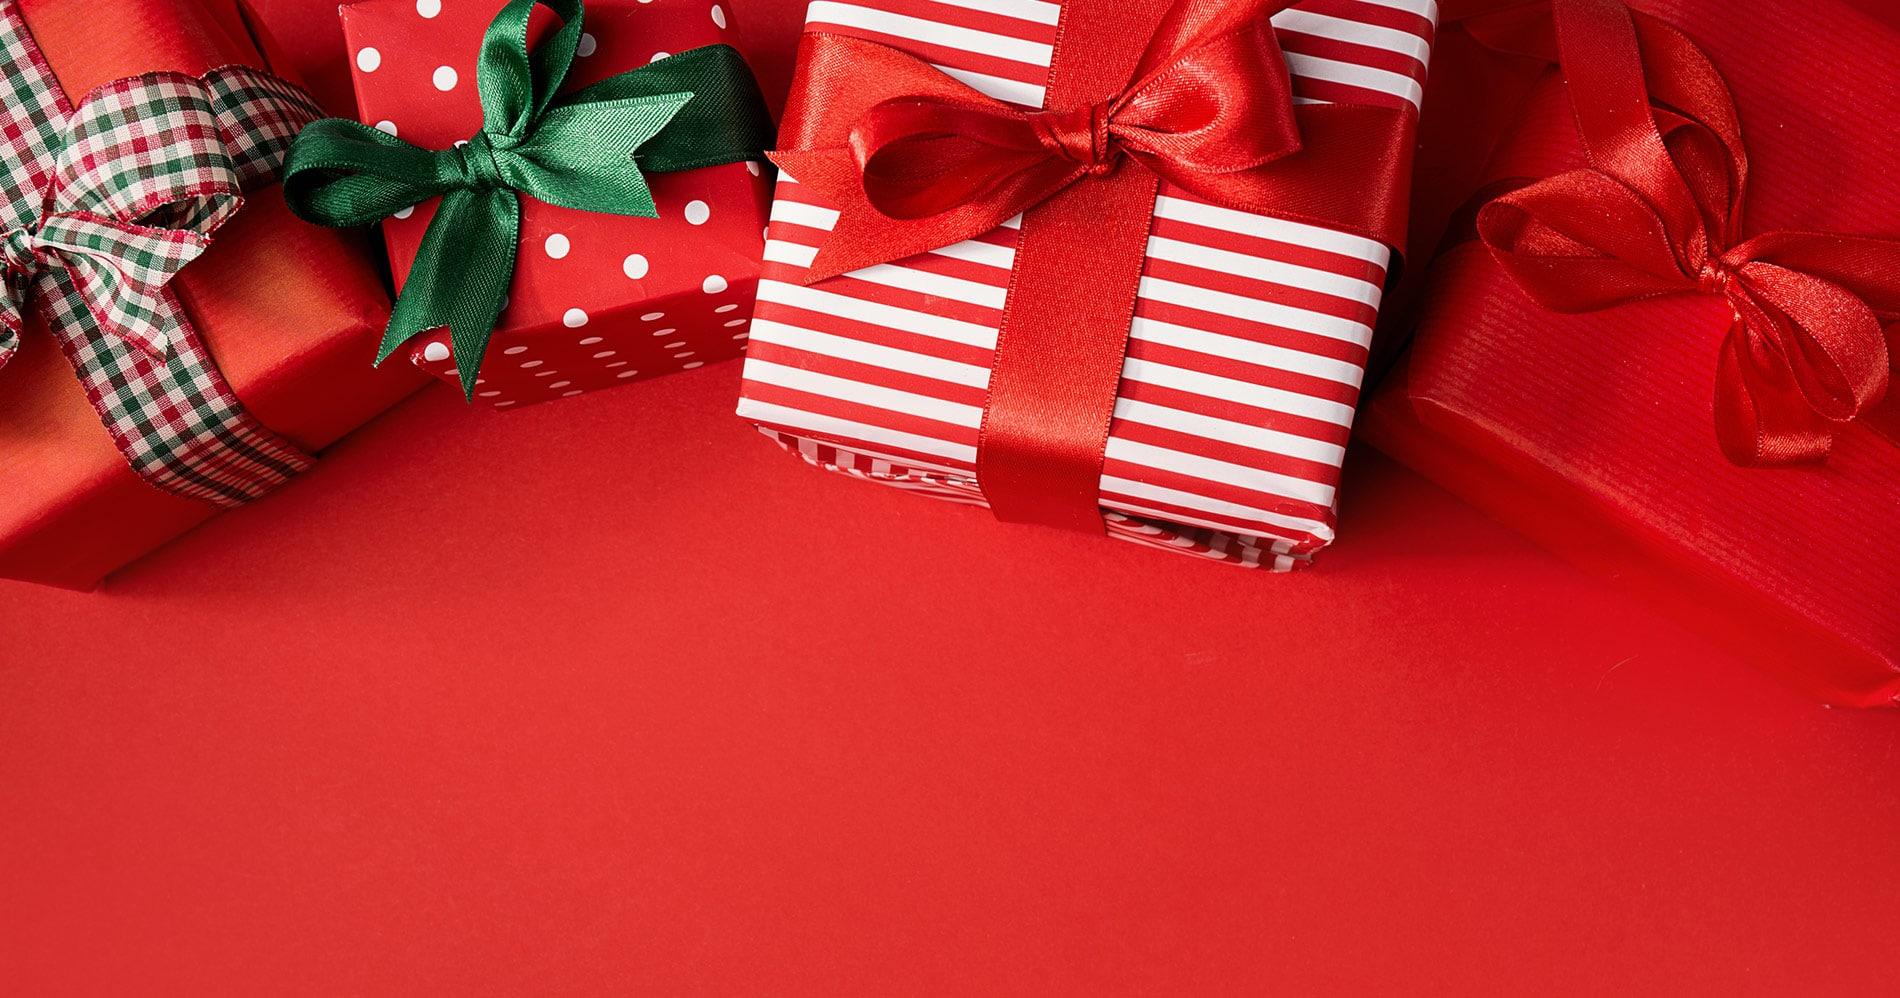 regali ideali per natale